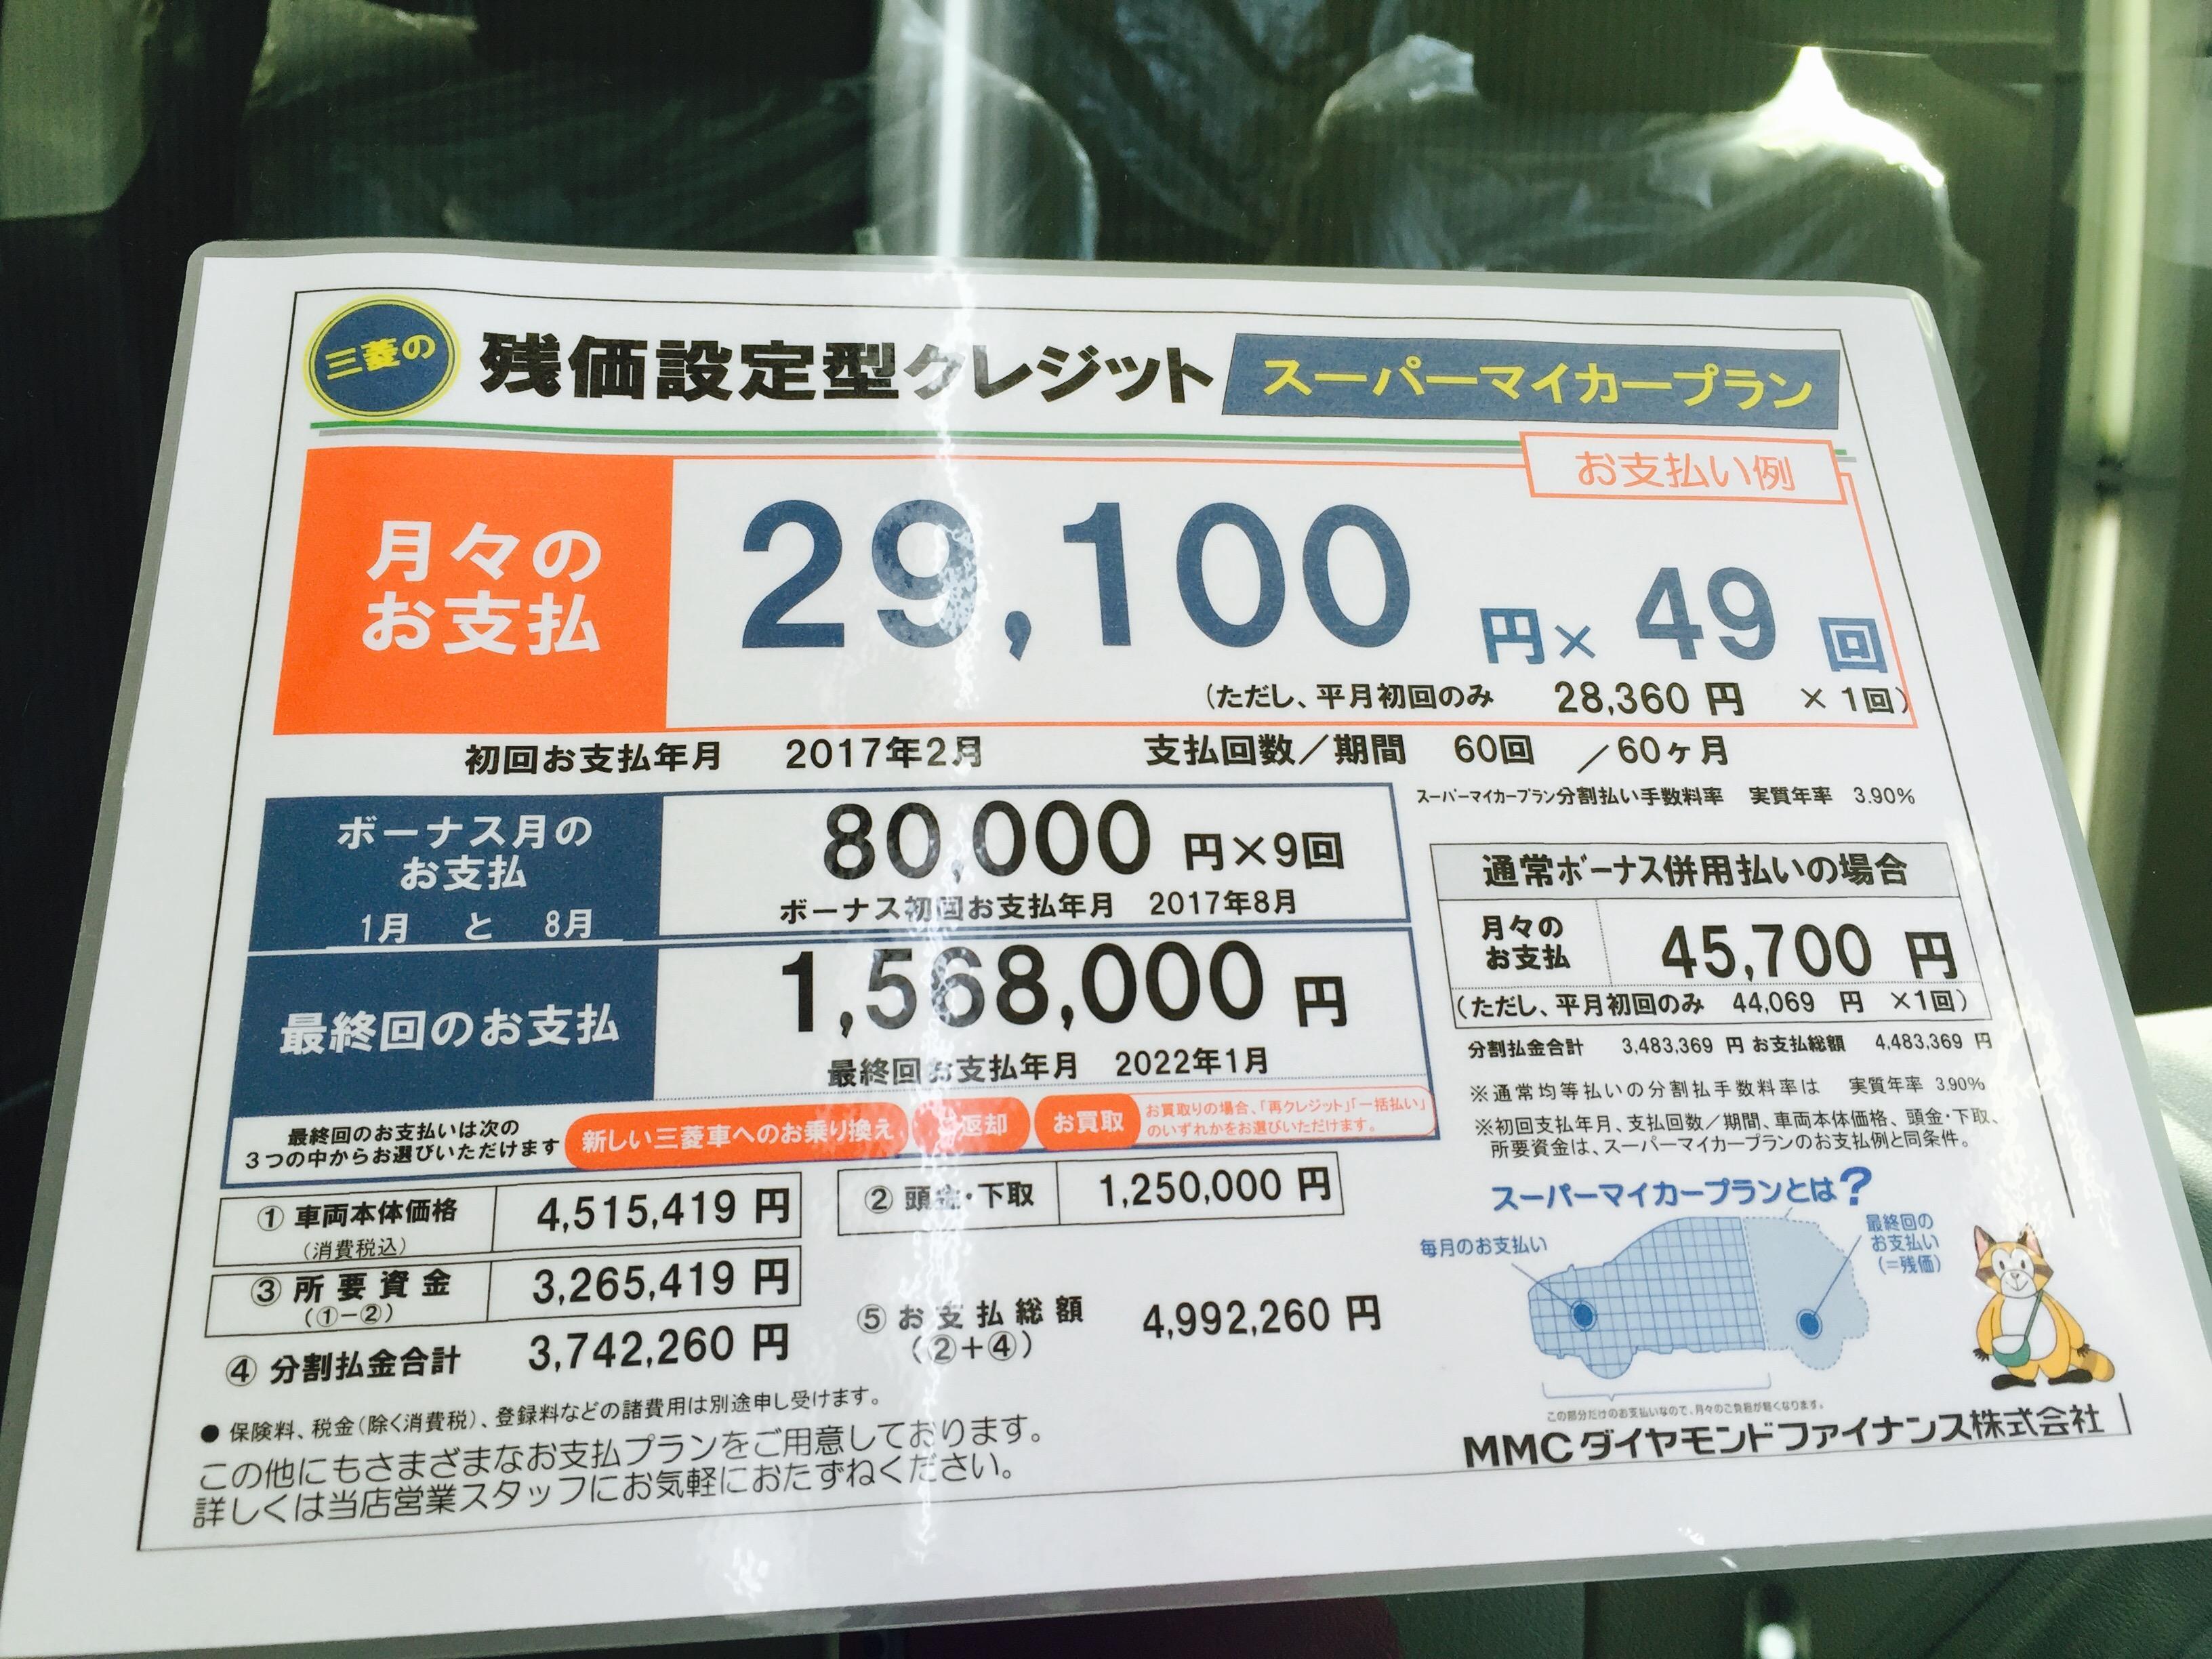 https://www.hyogo-mitsubishi.com/shop/takarazuka/files/takassupesupermycar.JPG